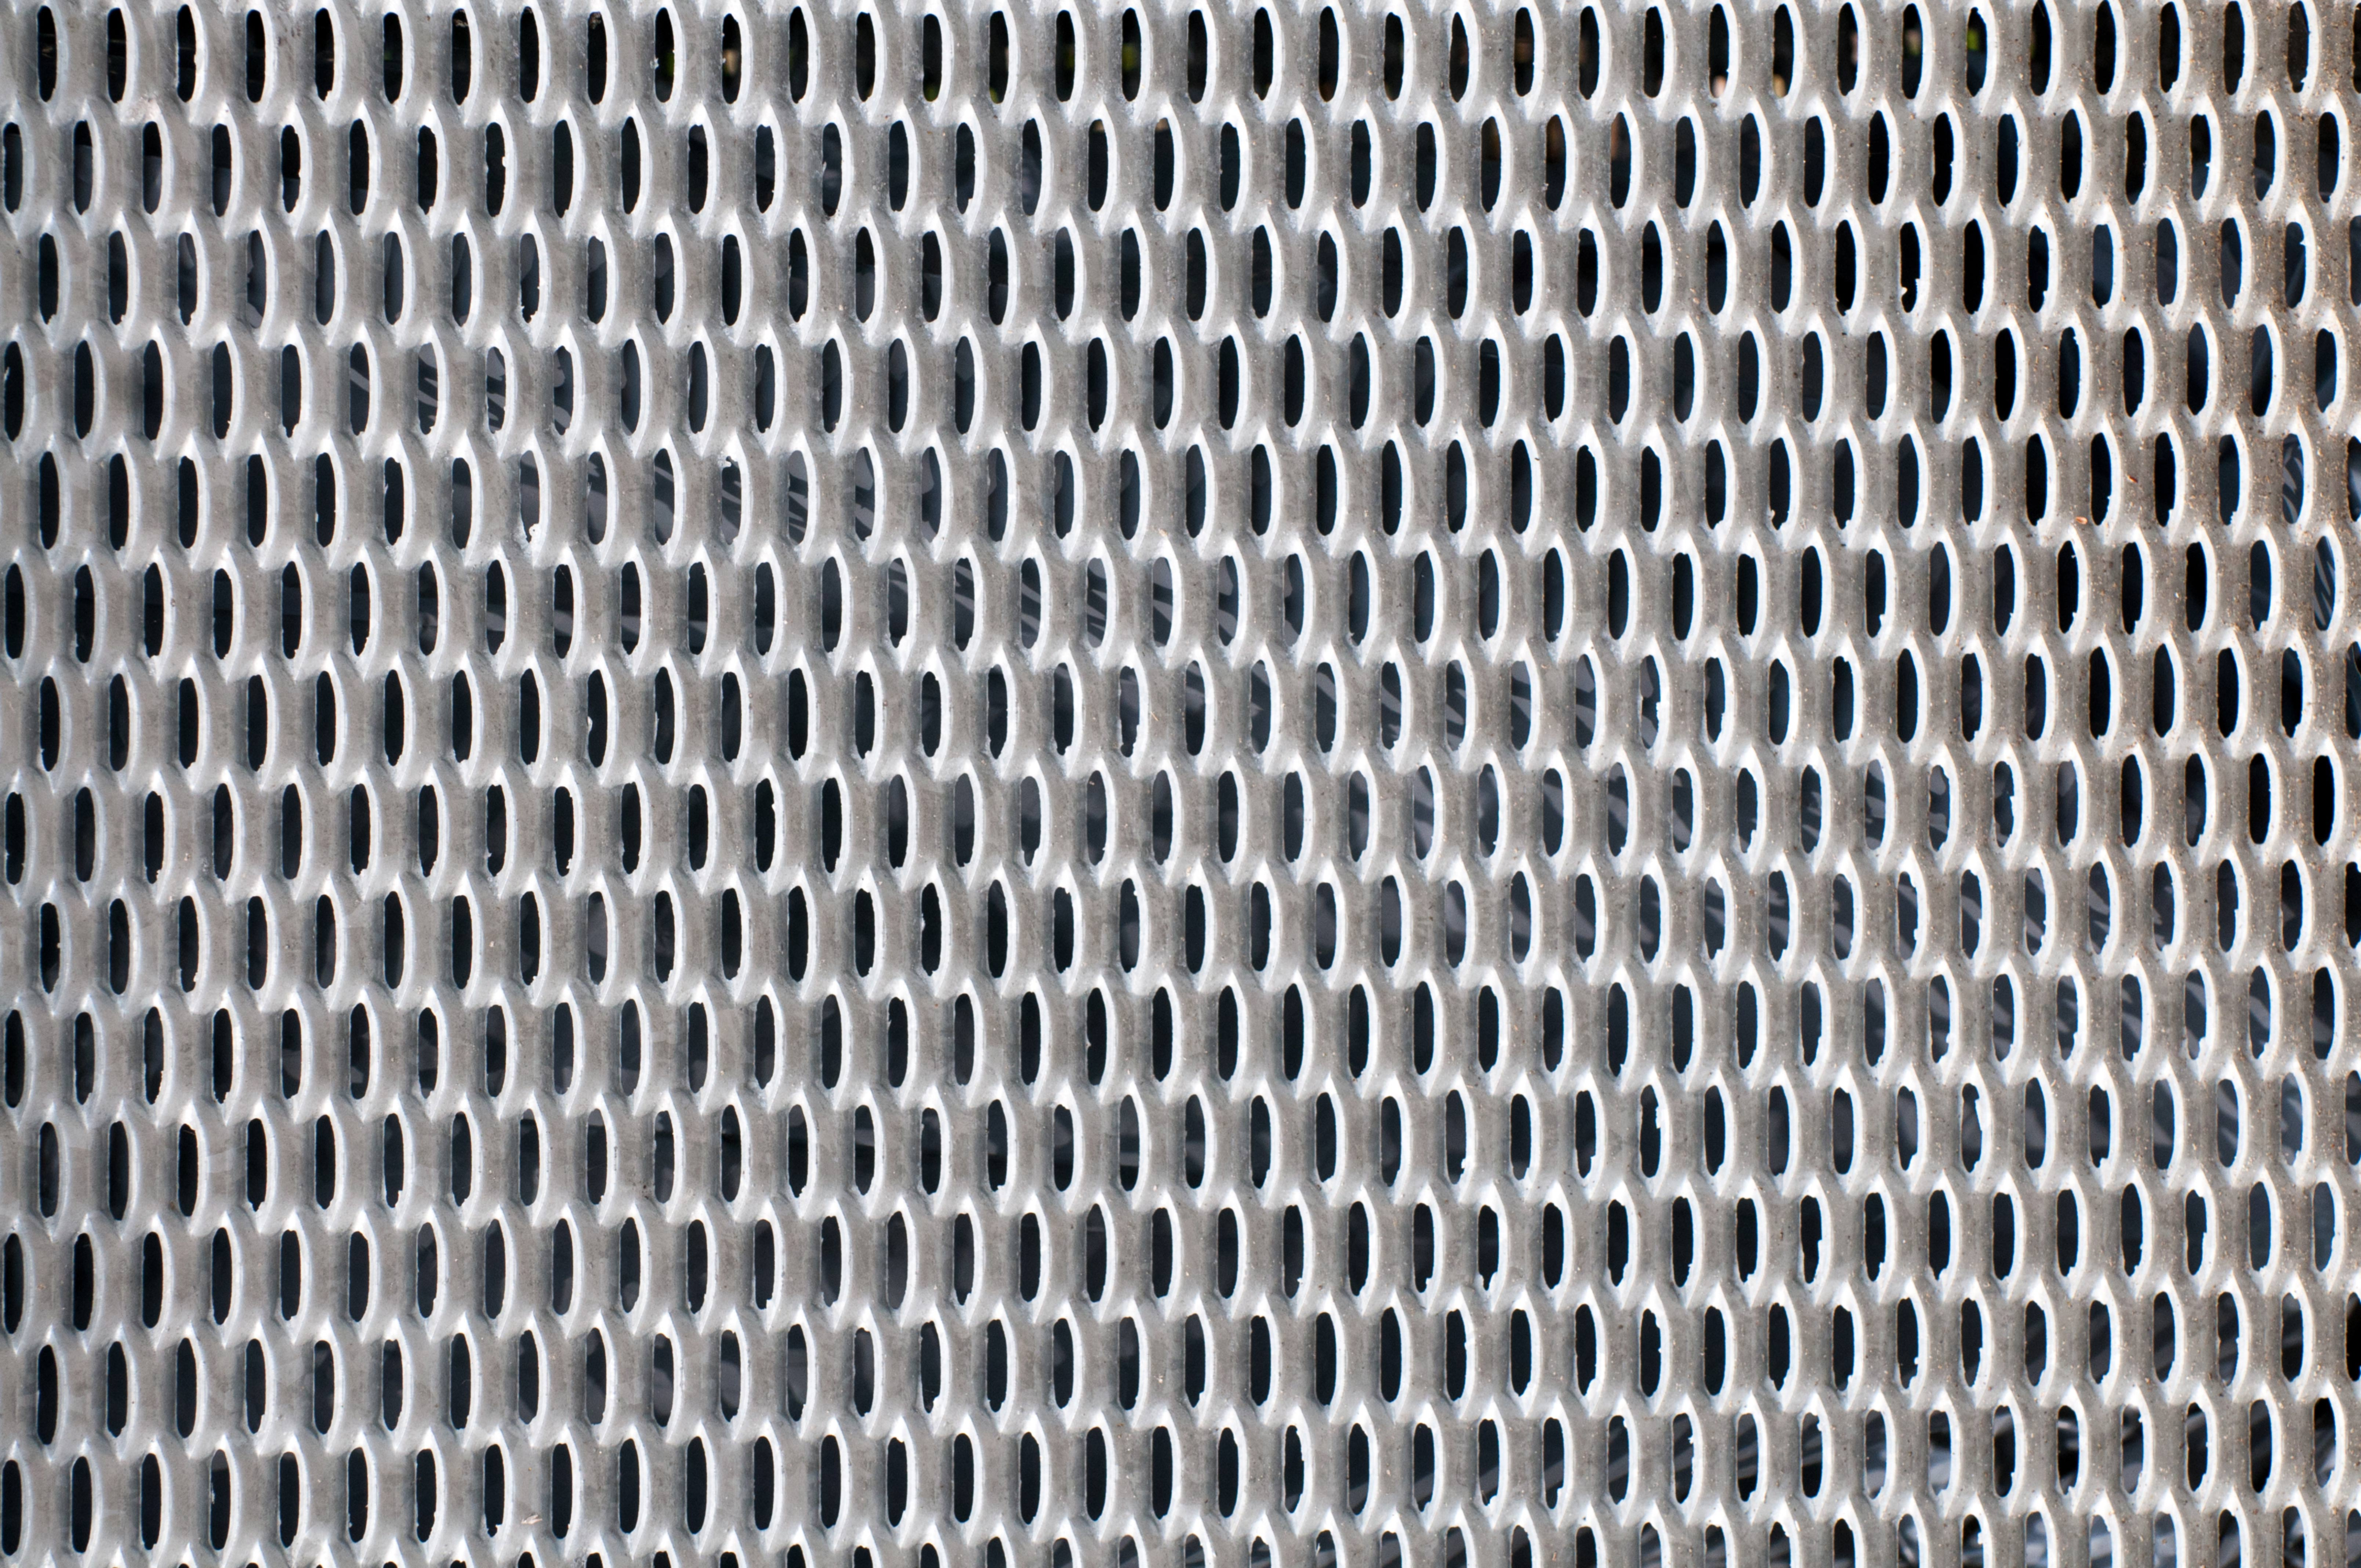 Perforated metal mesh close-up pattern